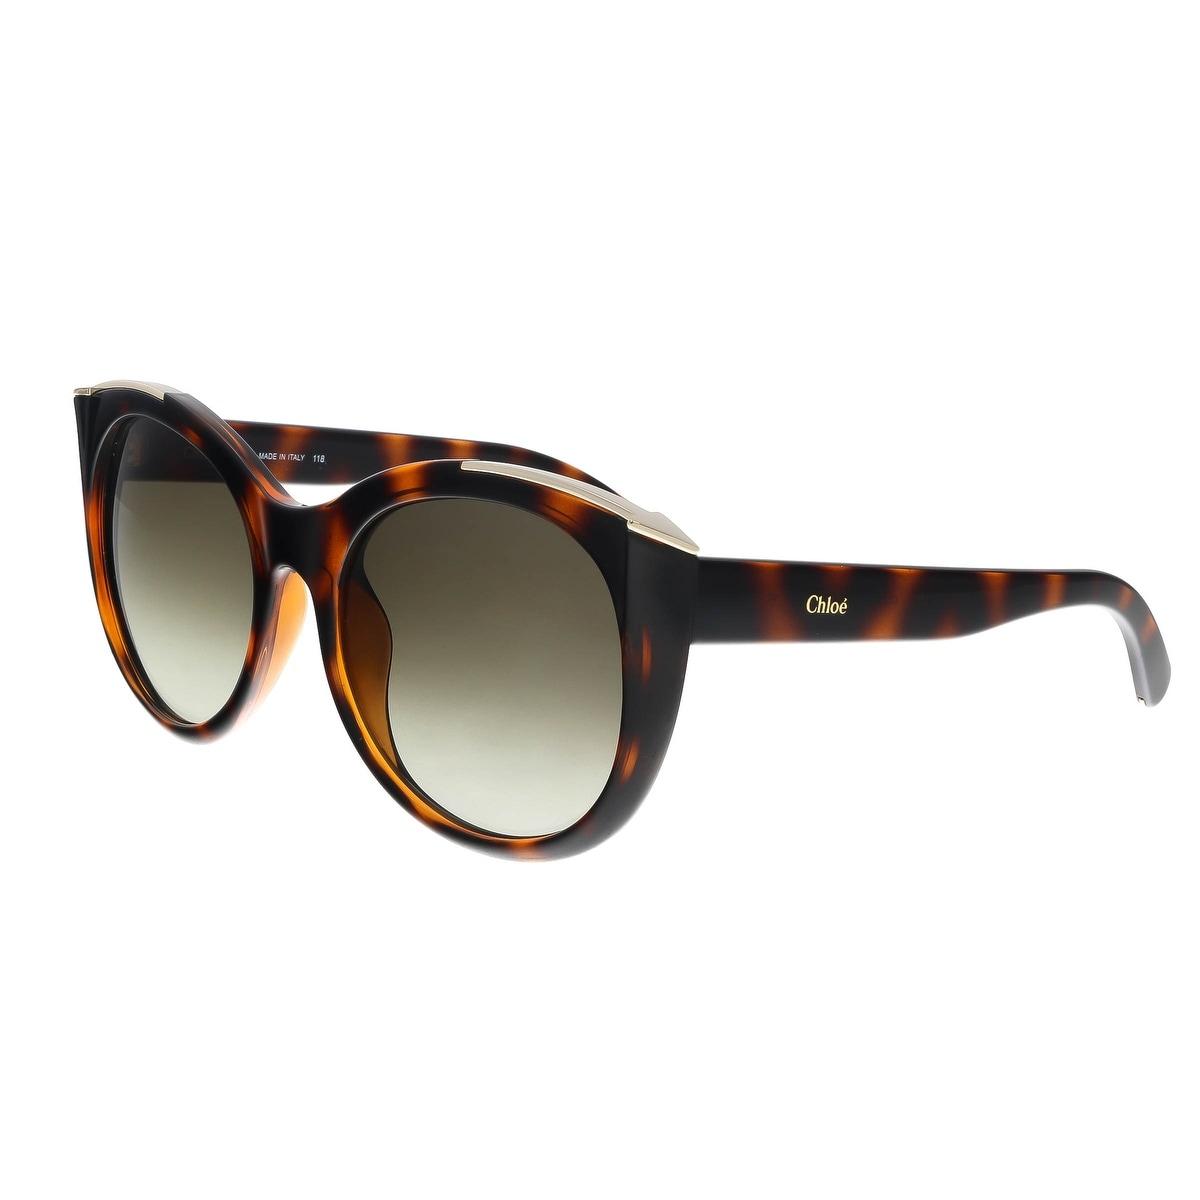 8fb159059f69 Chloe Sunglasses